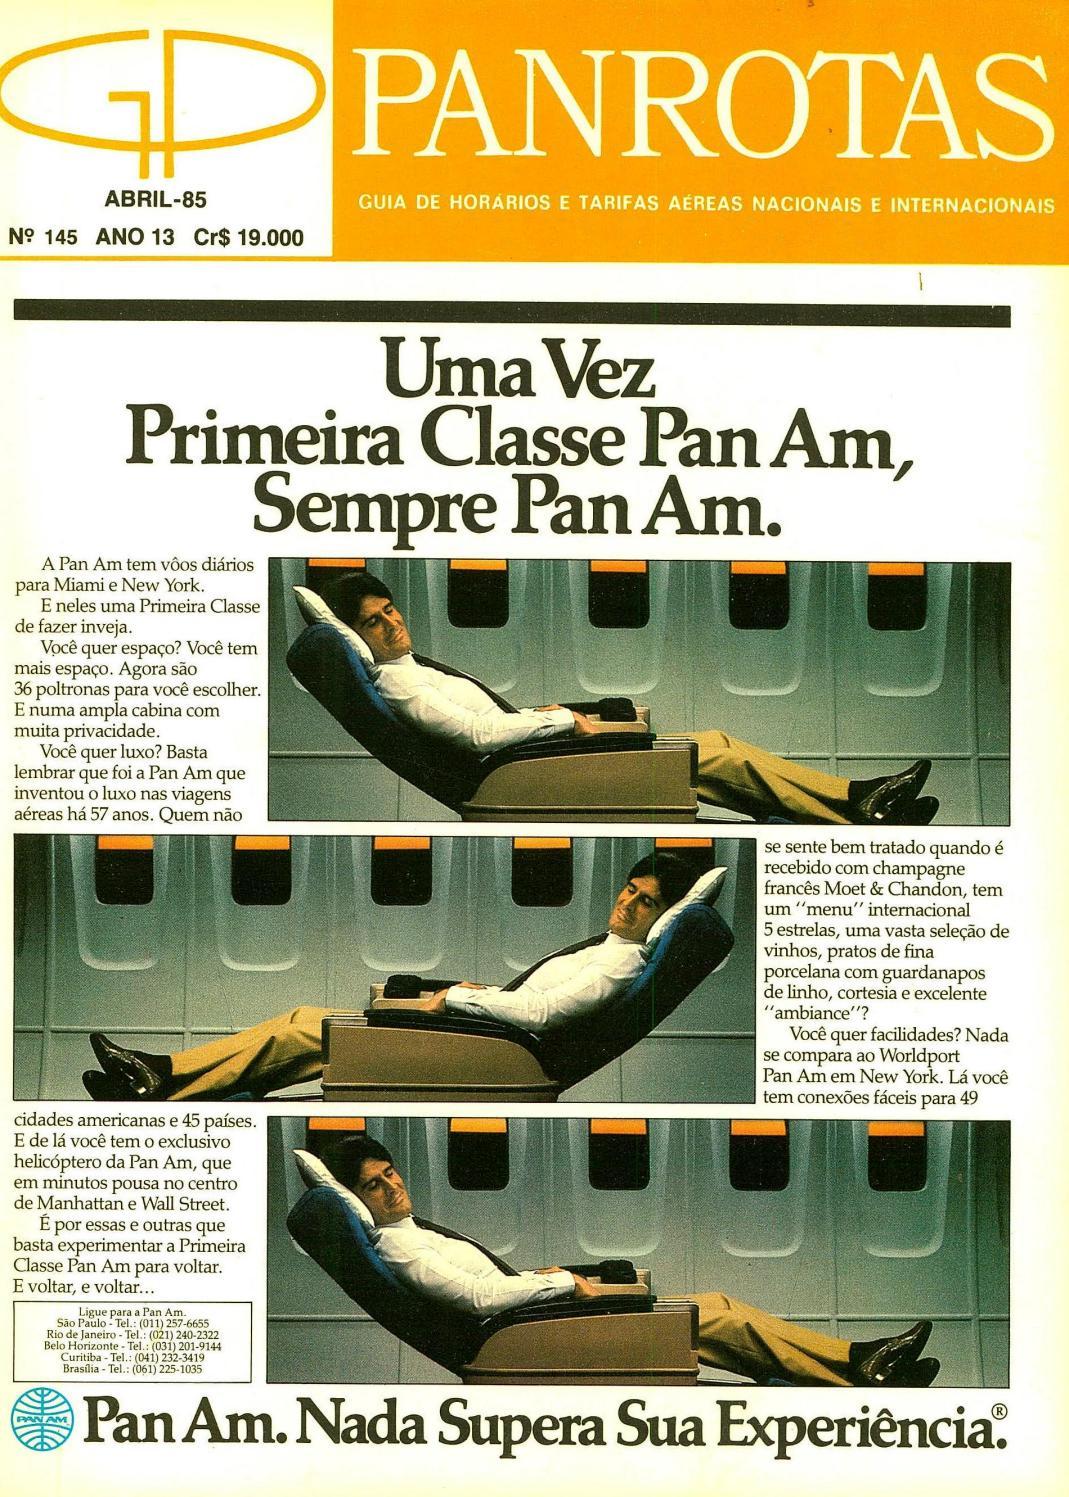 a322ee393 Guia PANROTAS - Edição 145 - Abril 1985 by PANROTAS Editora - issuu